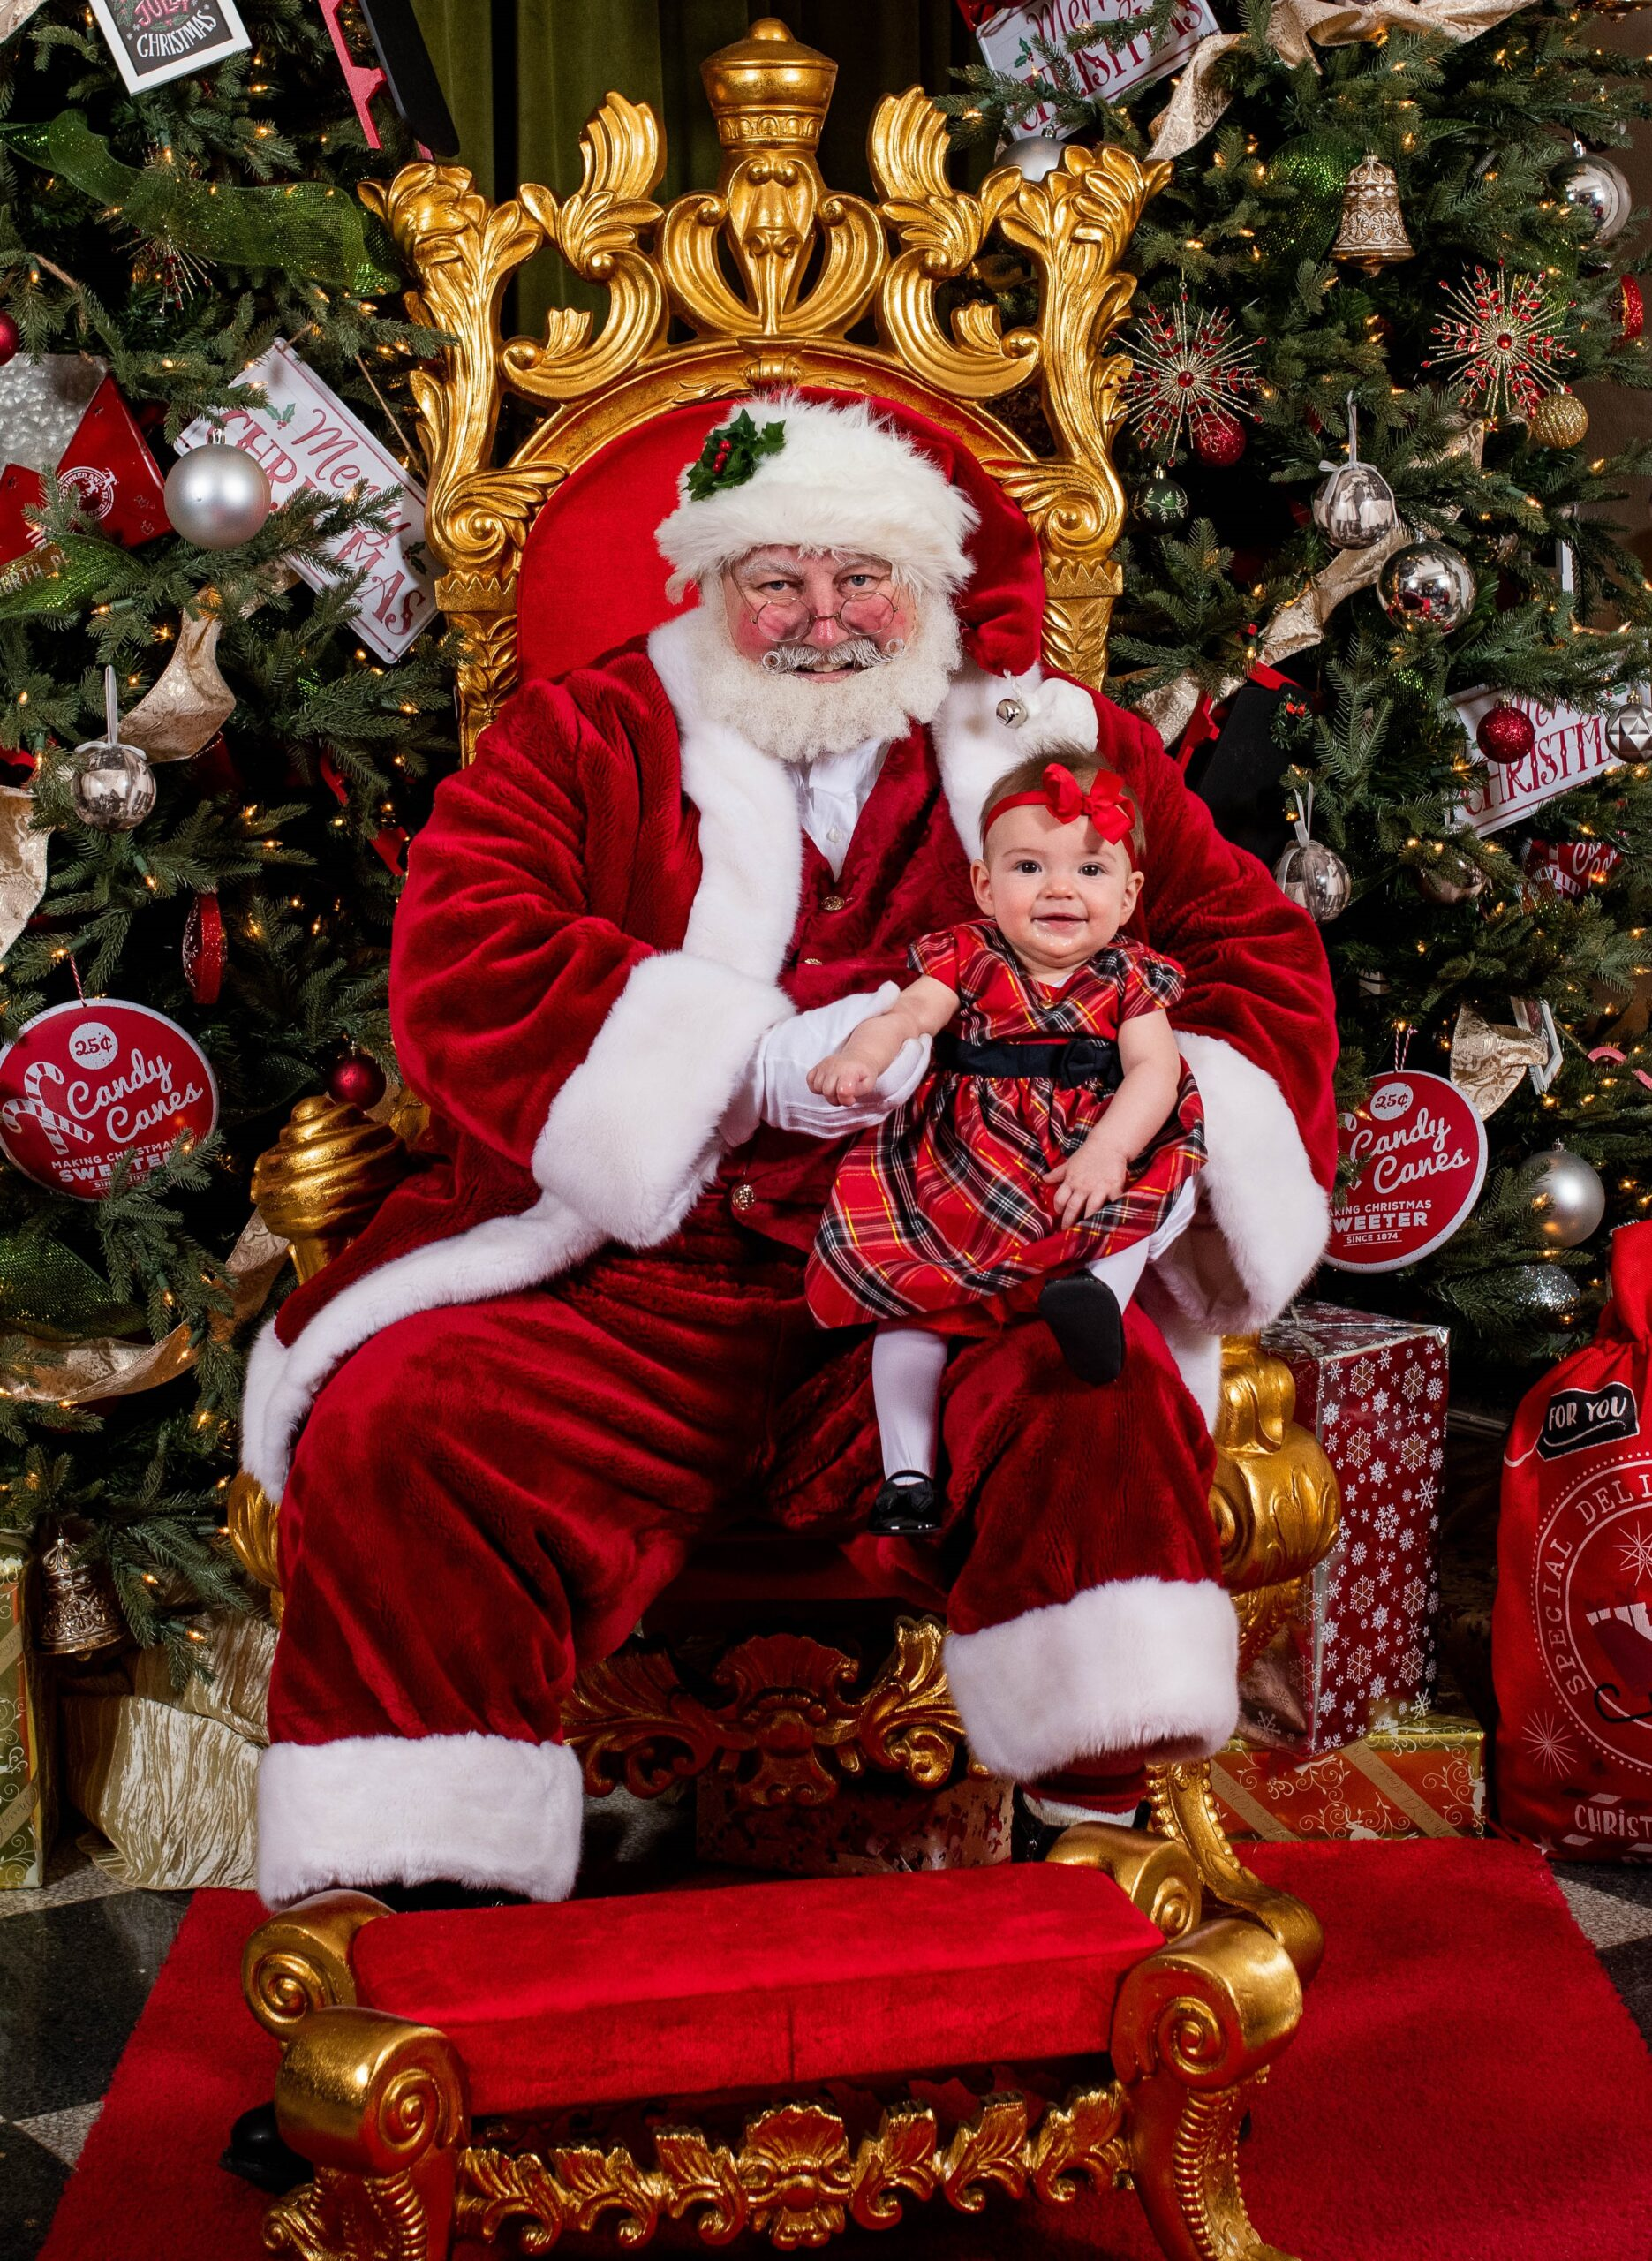 Santa Earl and precious